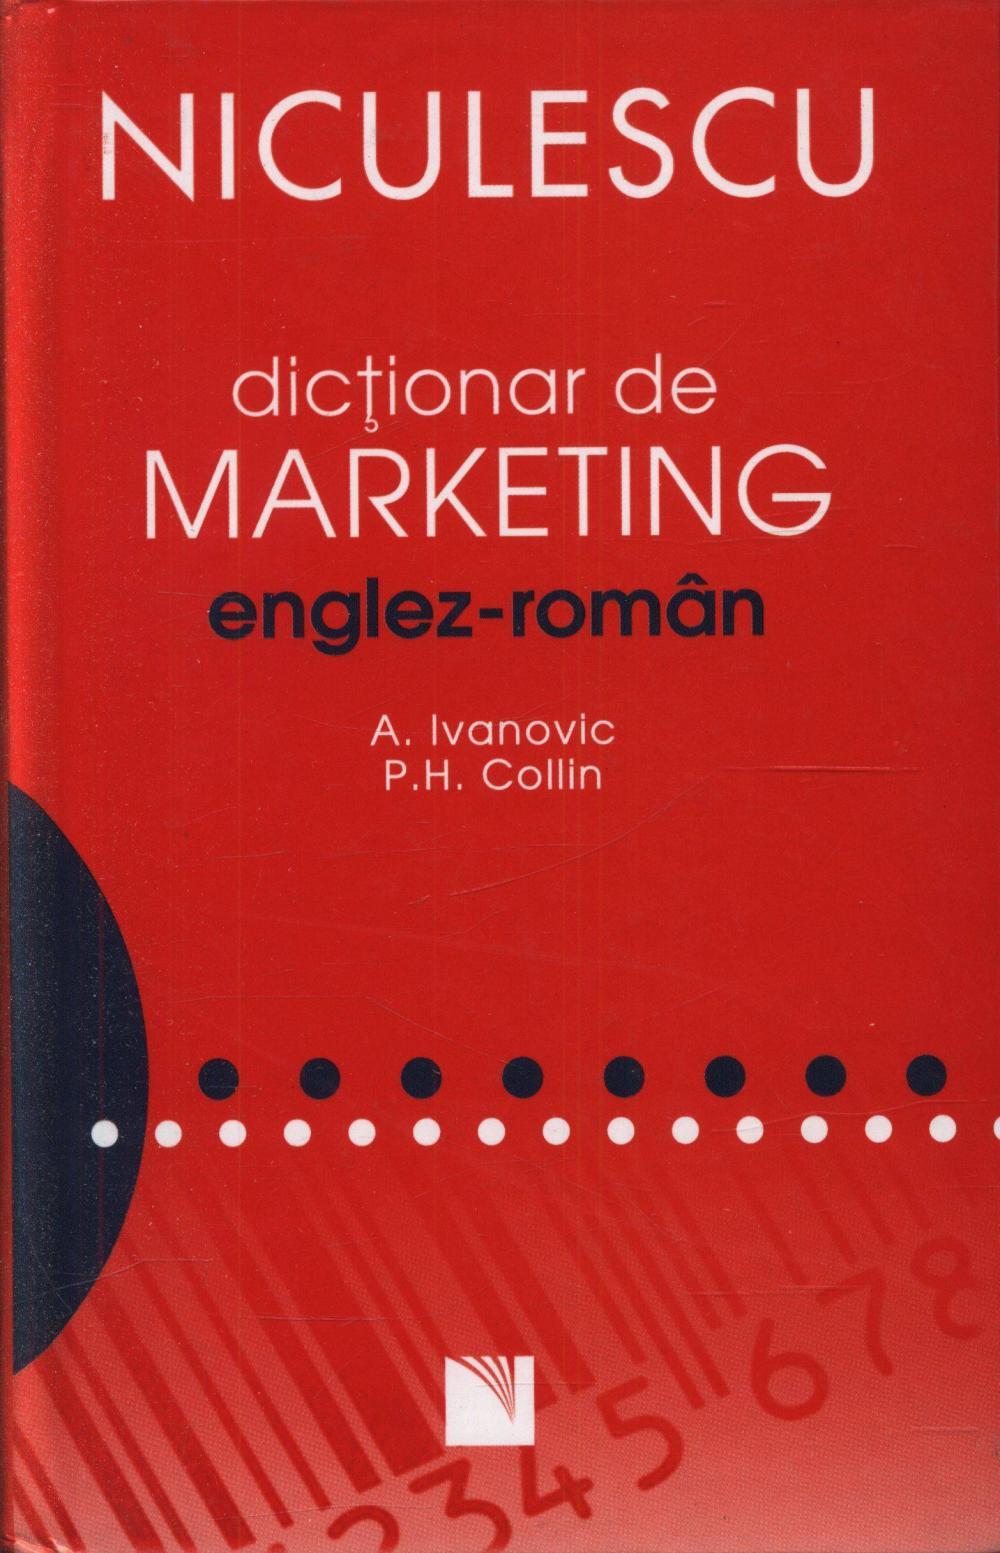 DICTIONAR DE MARKETING ENGLEZ-ROMAN